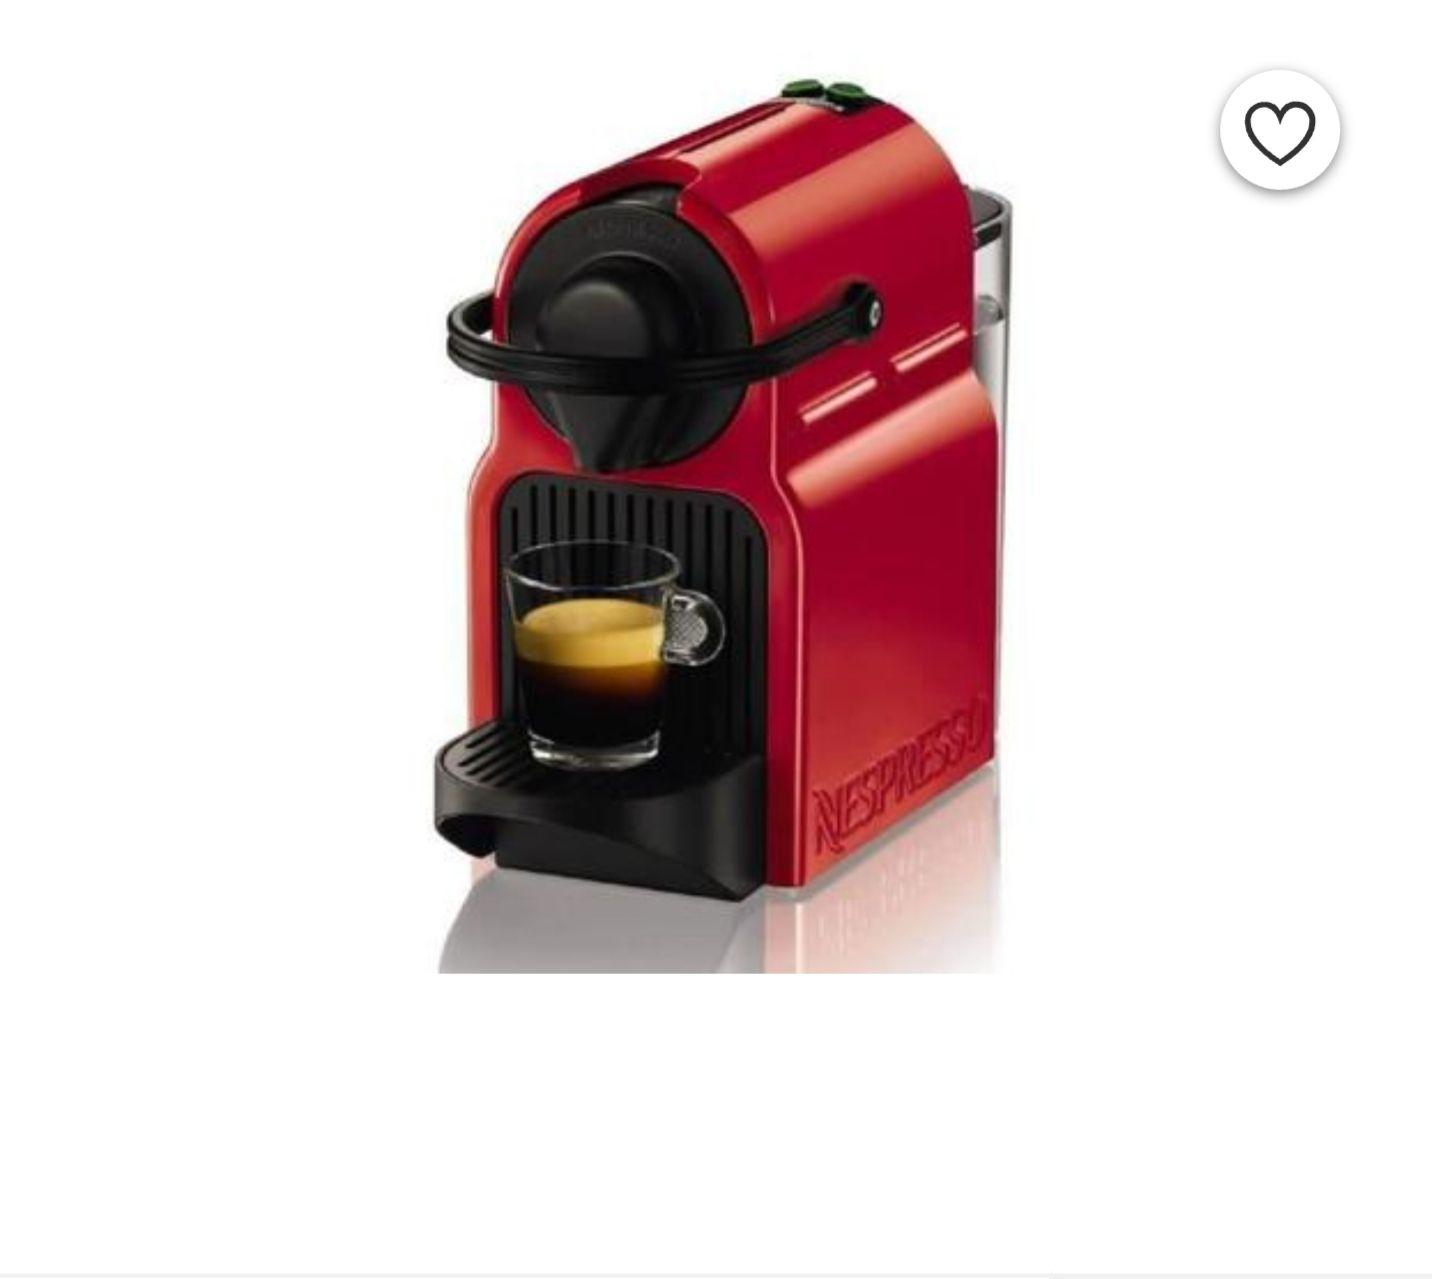 Machine expresso à capsules Krups Inissia YY1531FD - Rouge rubis